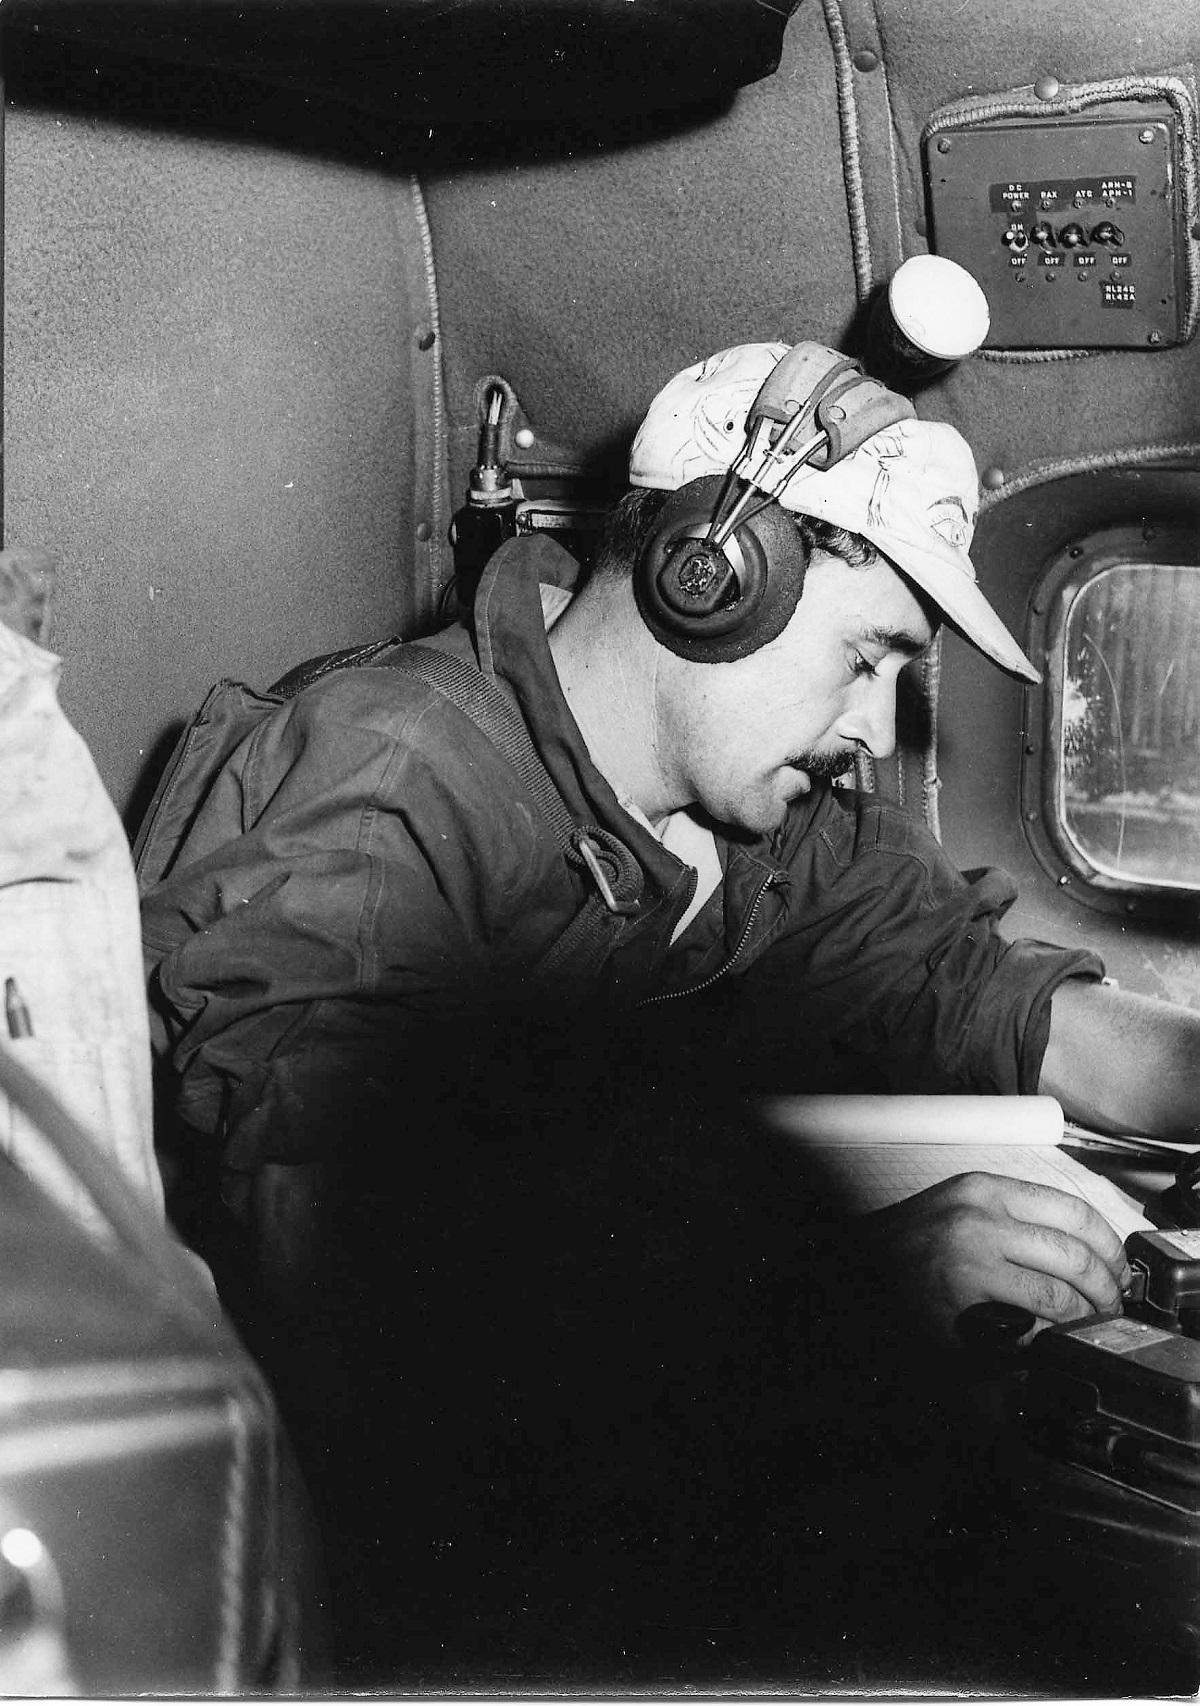 [ Aéronavale divers ] Radios volants, Radbo, Elbor, etc... - Page 2 4257_s10